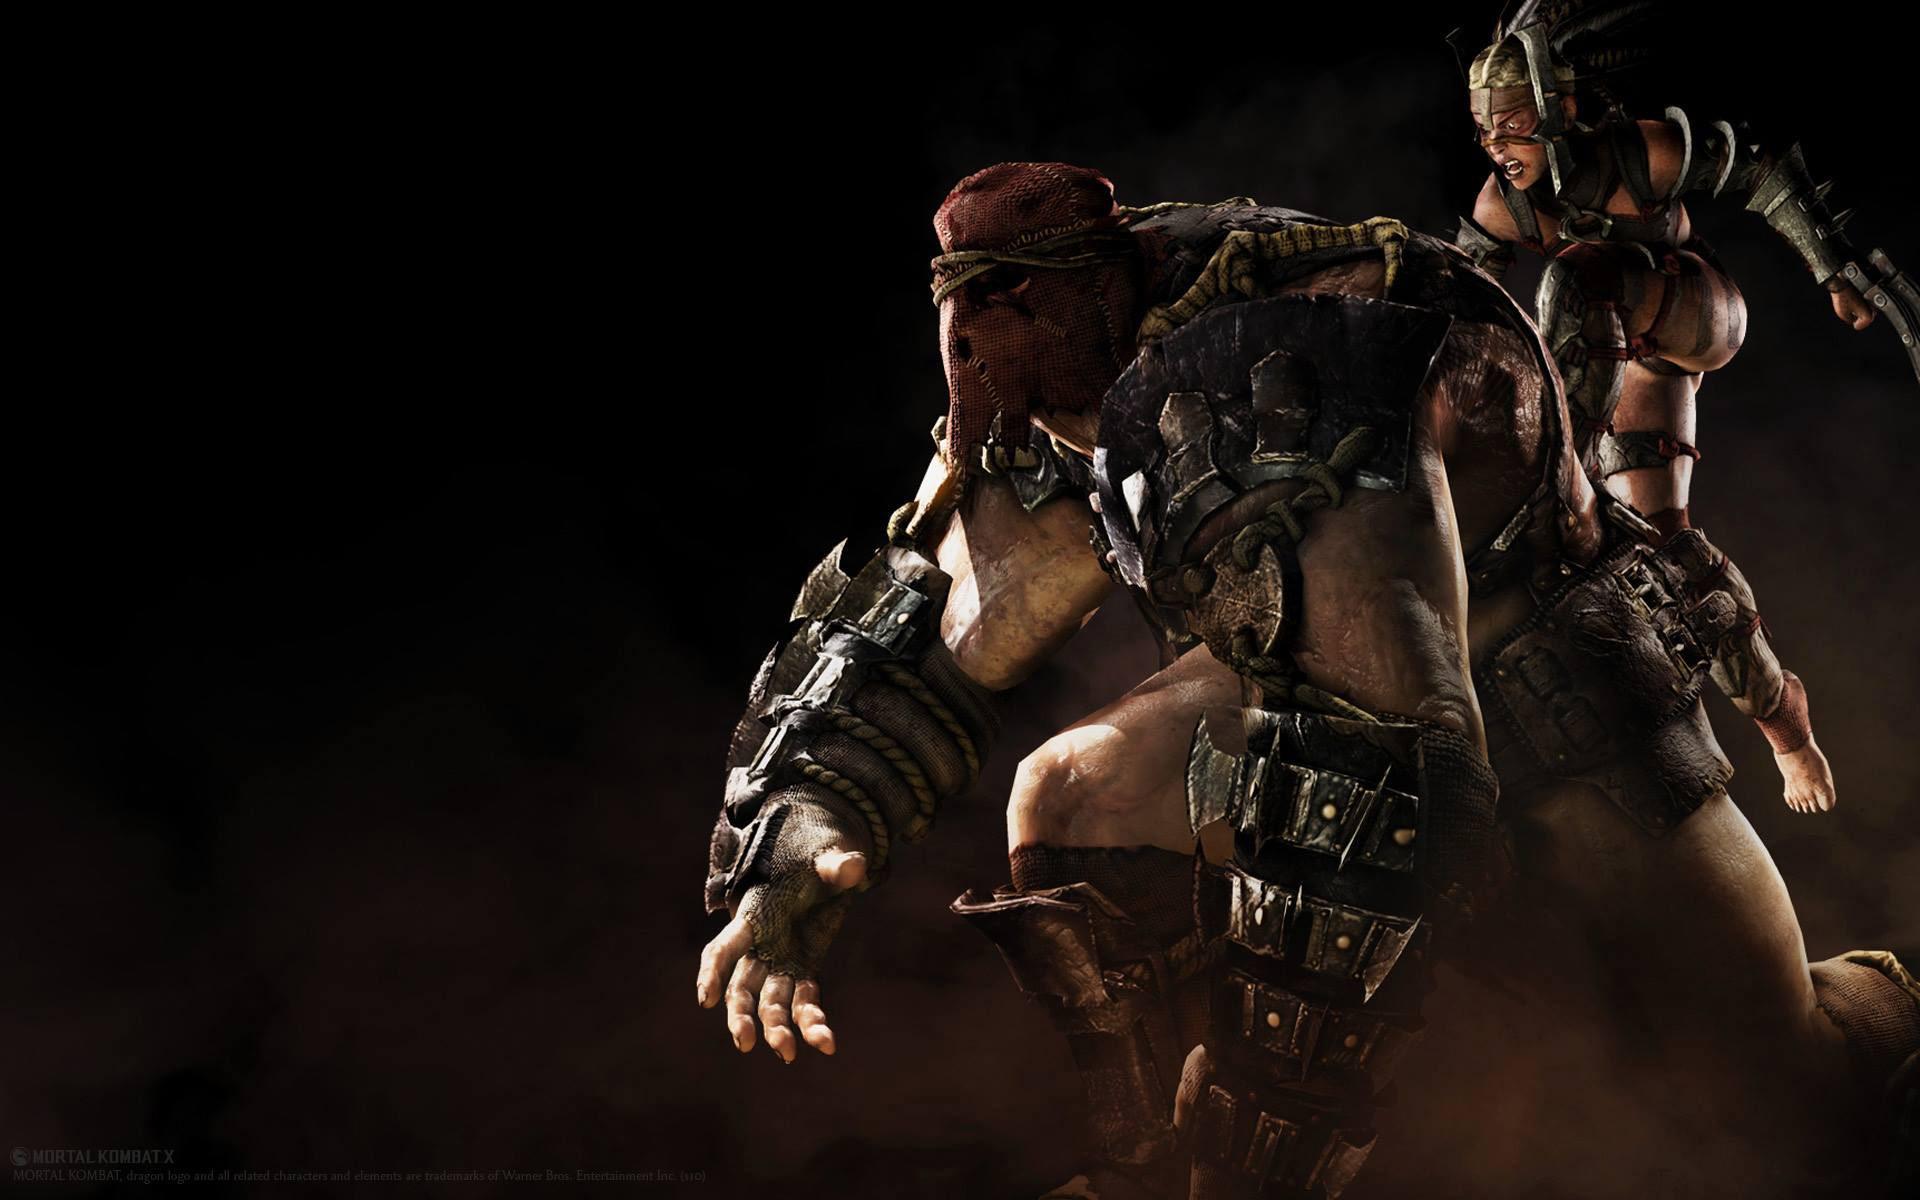 Watch Scorpion S Uncensored Mortal Kombat X Fatality Plus New Art